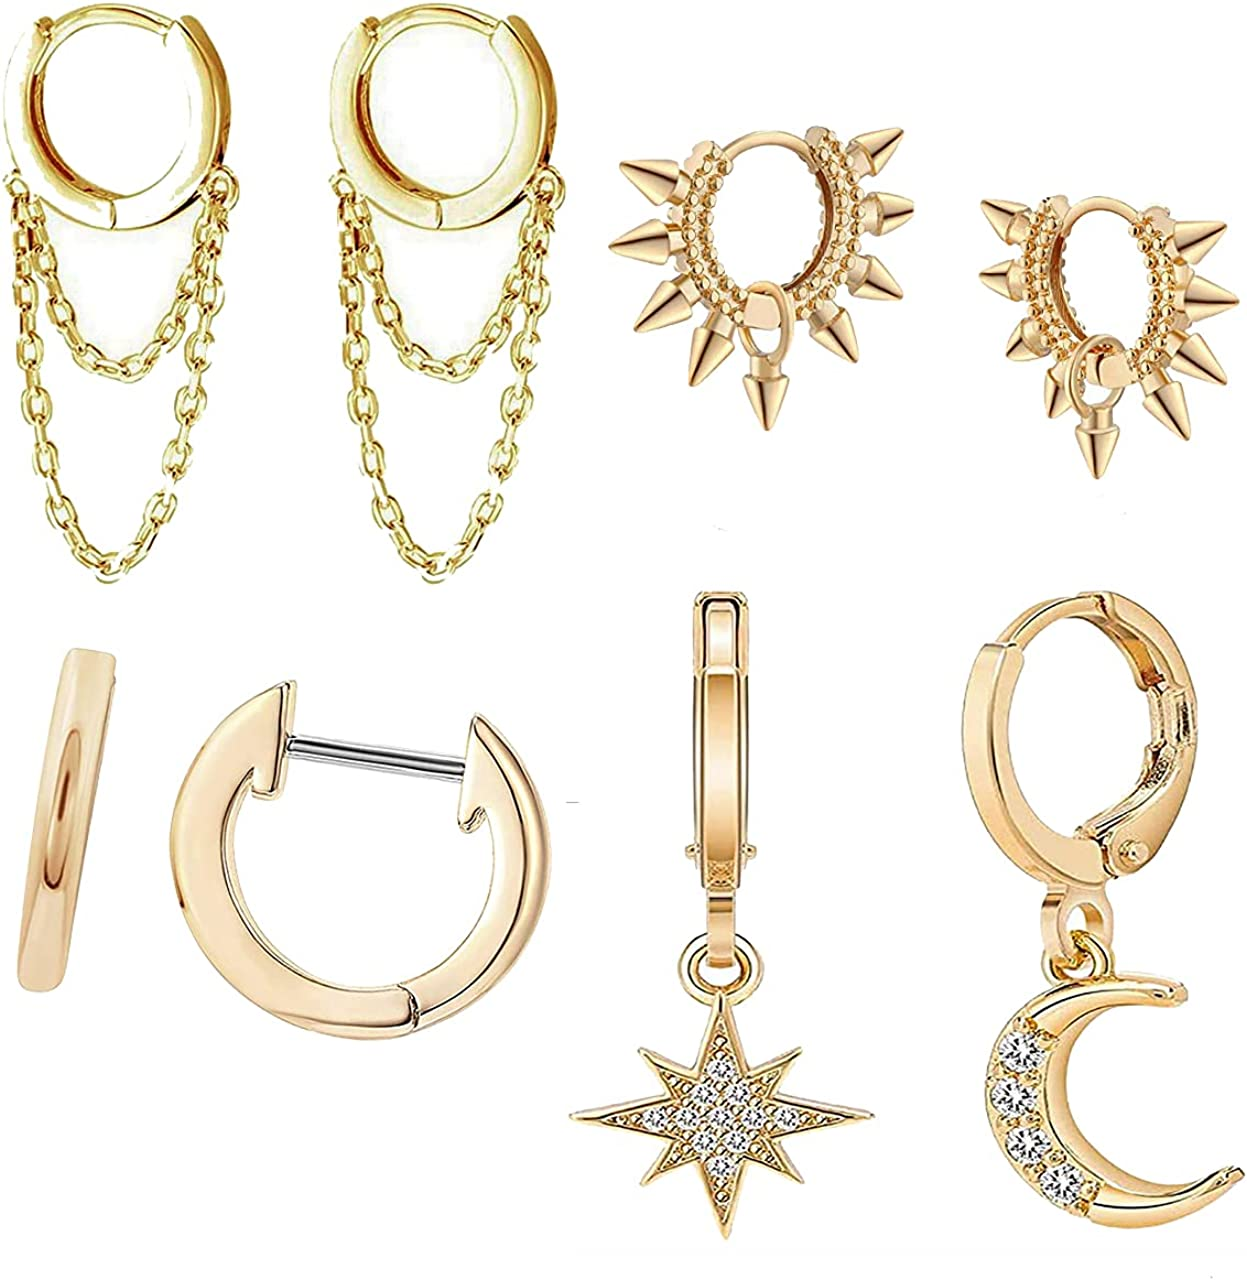 Seaberila 8 Pcs Austin Mall Huggie Hoop Animer and price revision Earrings Spi Punk Goth Stud